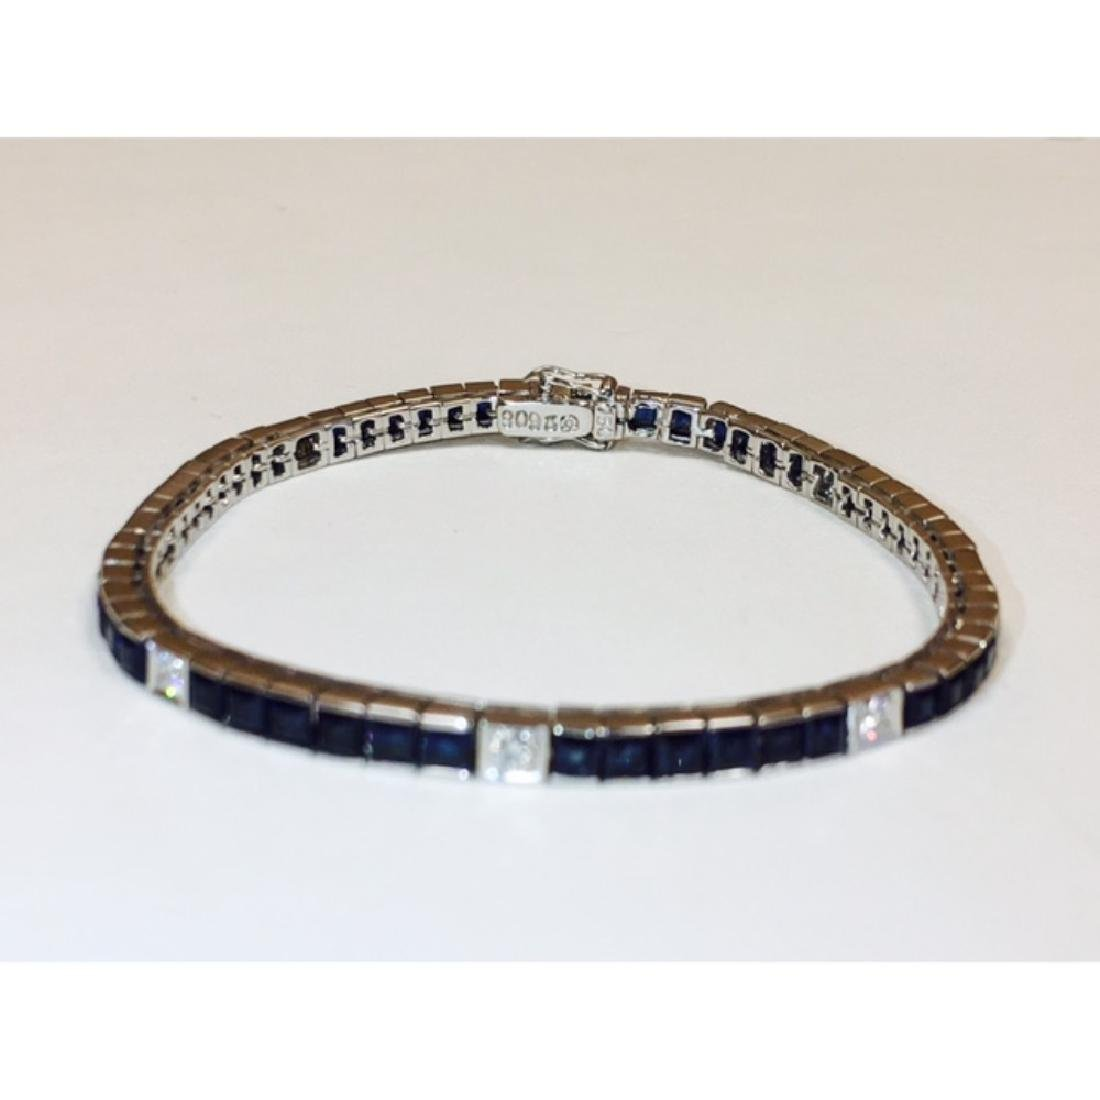 18K, 4.00 Carat Blue Sapphire and Diamond Bracelet - 4